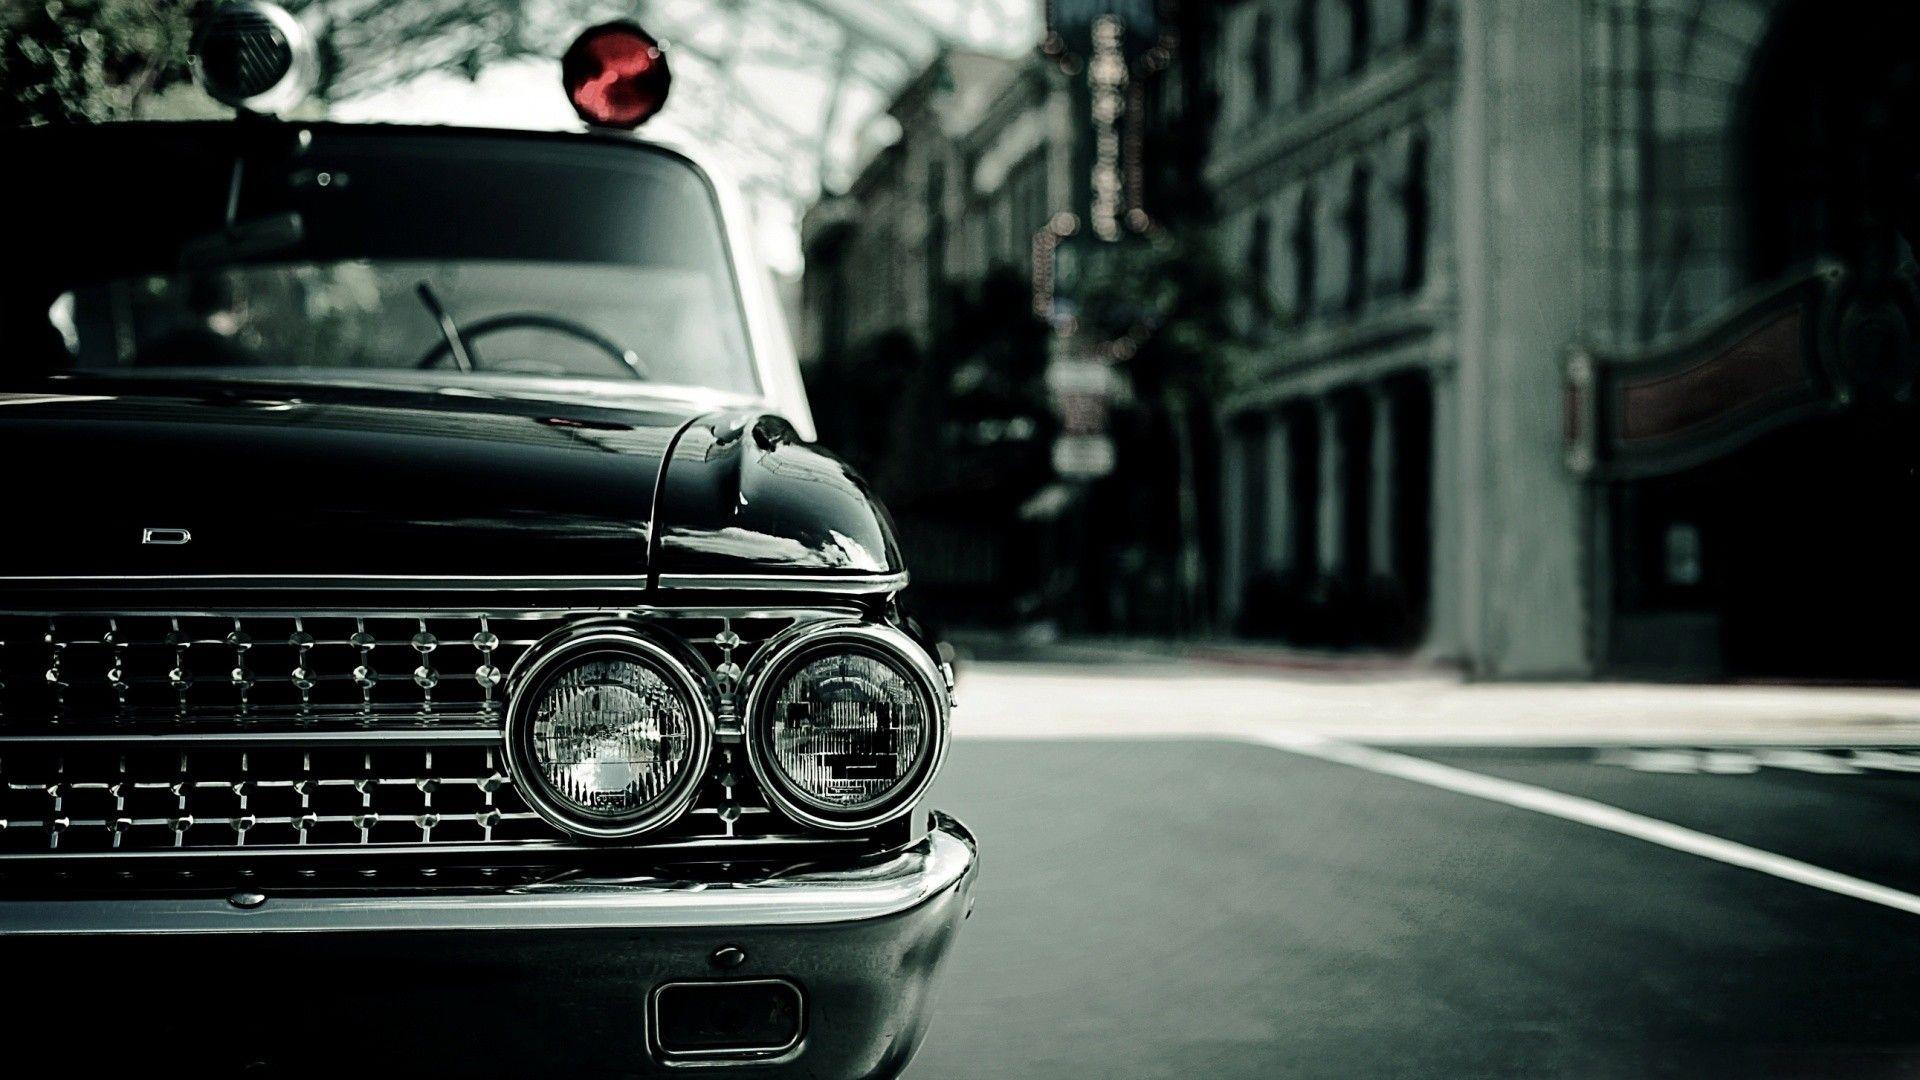 Vintage Car Headlights Photography Wallpaper No 237950 Car Backgrounds Car Photography Car